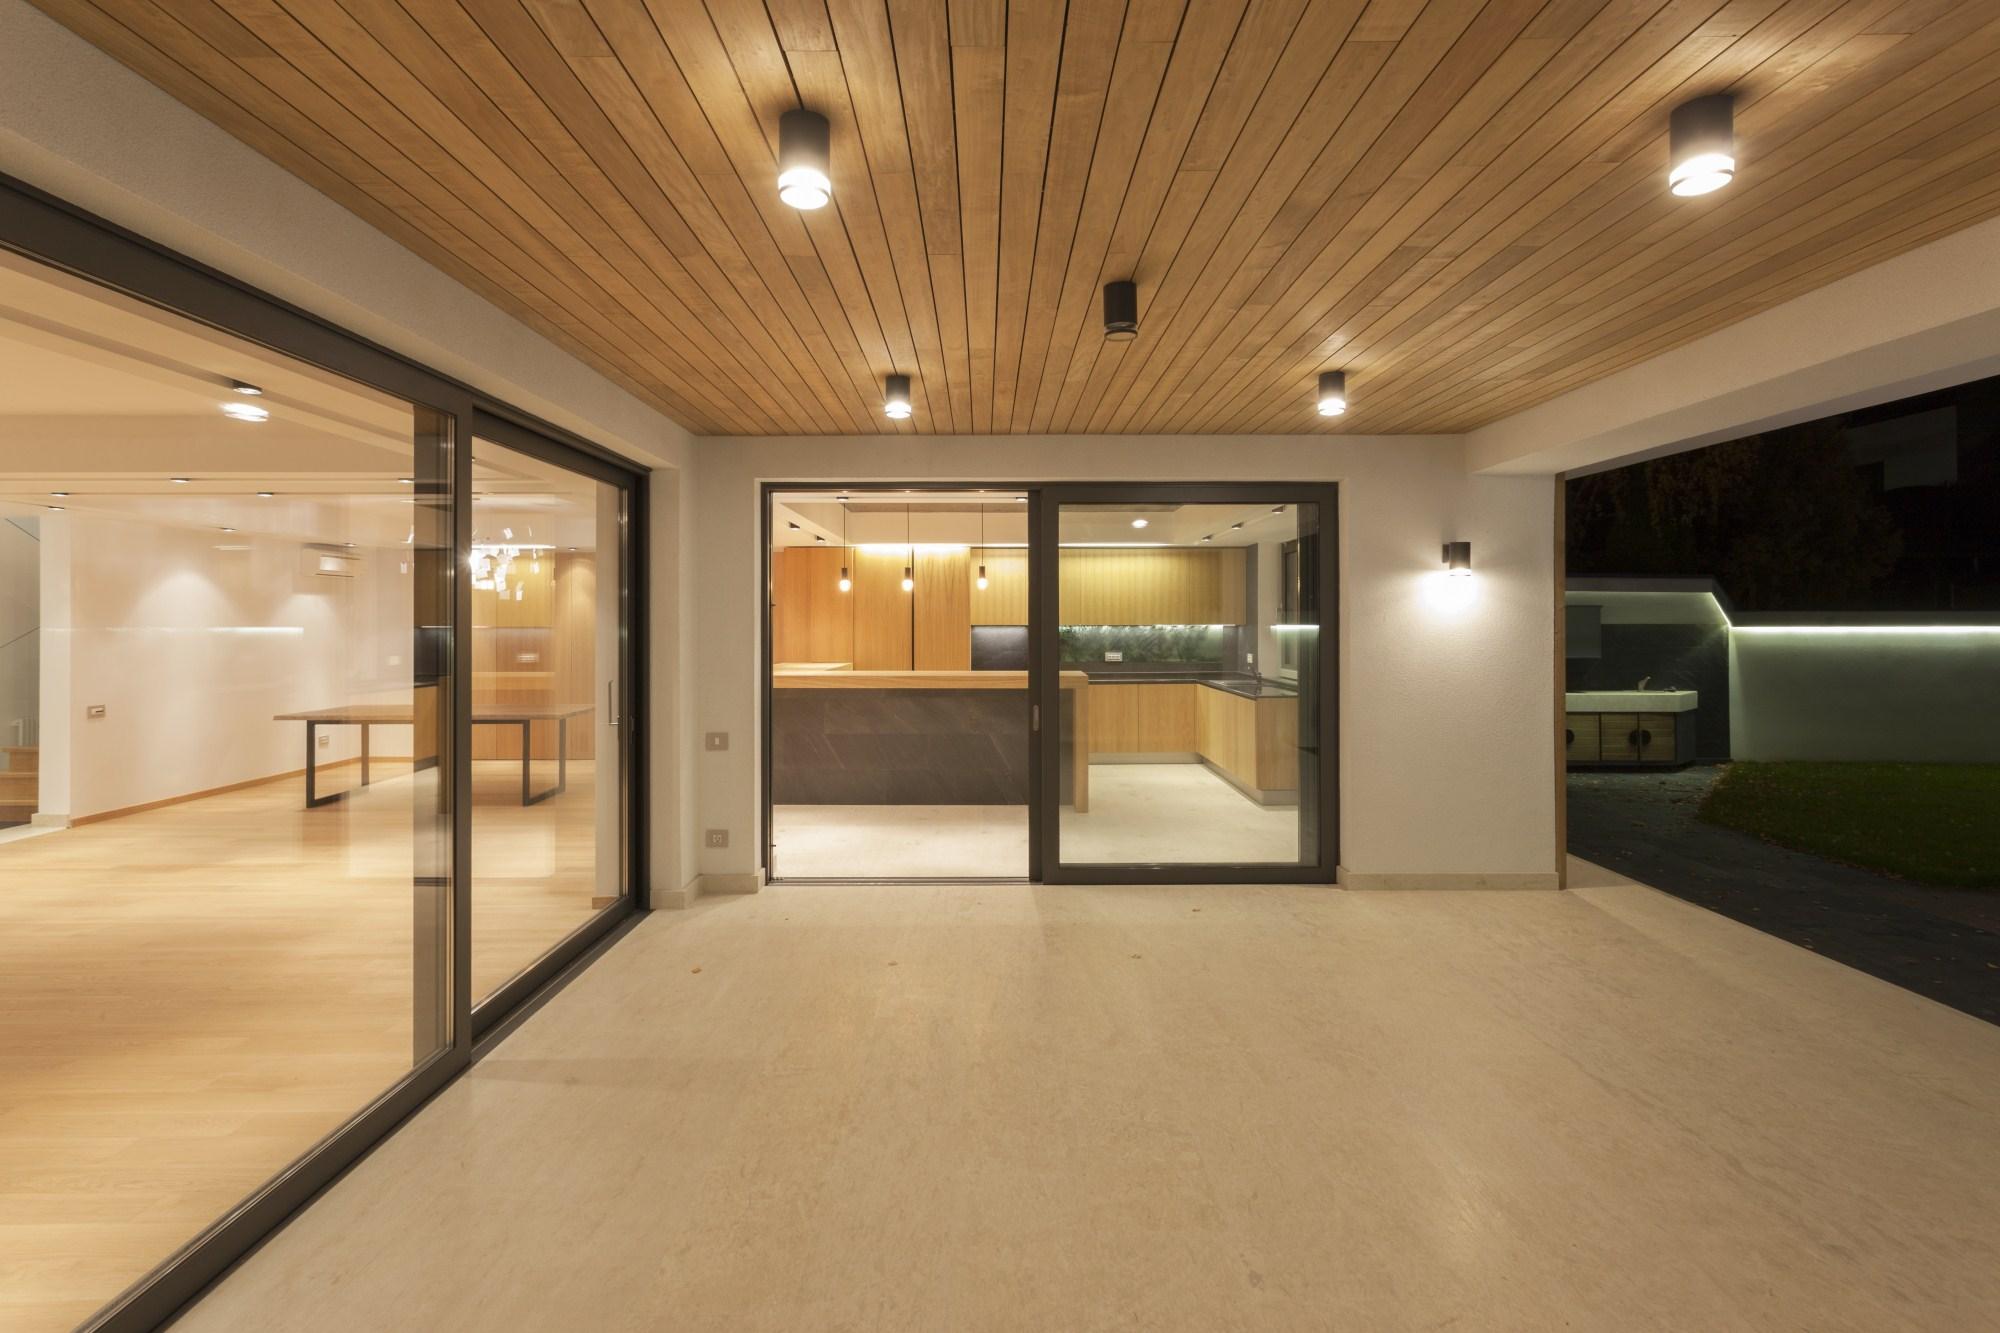 https://nbc-arhitect.ro/wp-content/uploads/2020/10/NBC-Arhitect-_-interiors-_-Vila-Pipera-_-Bucharest-Romania-_-interior-design-view_5.jpg